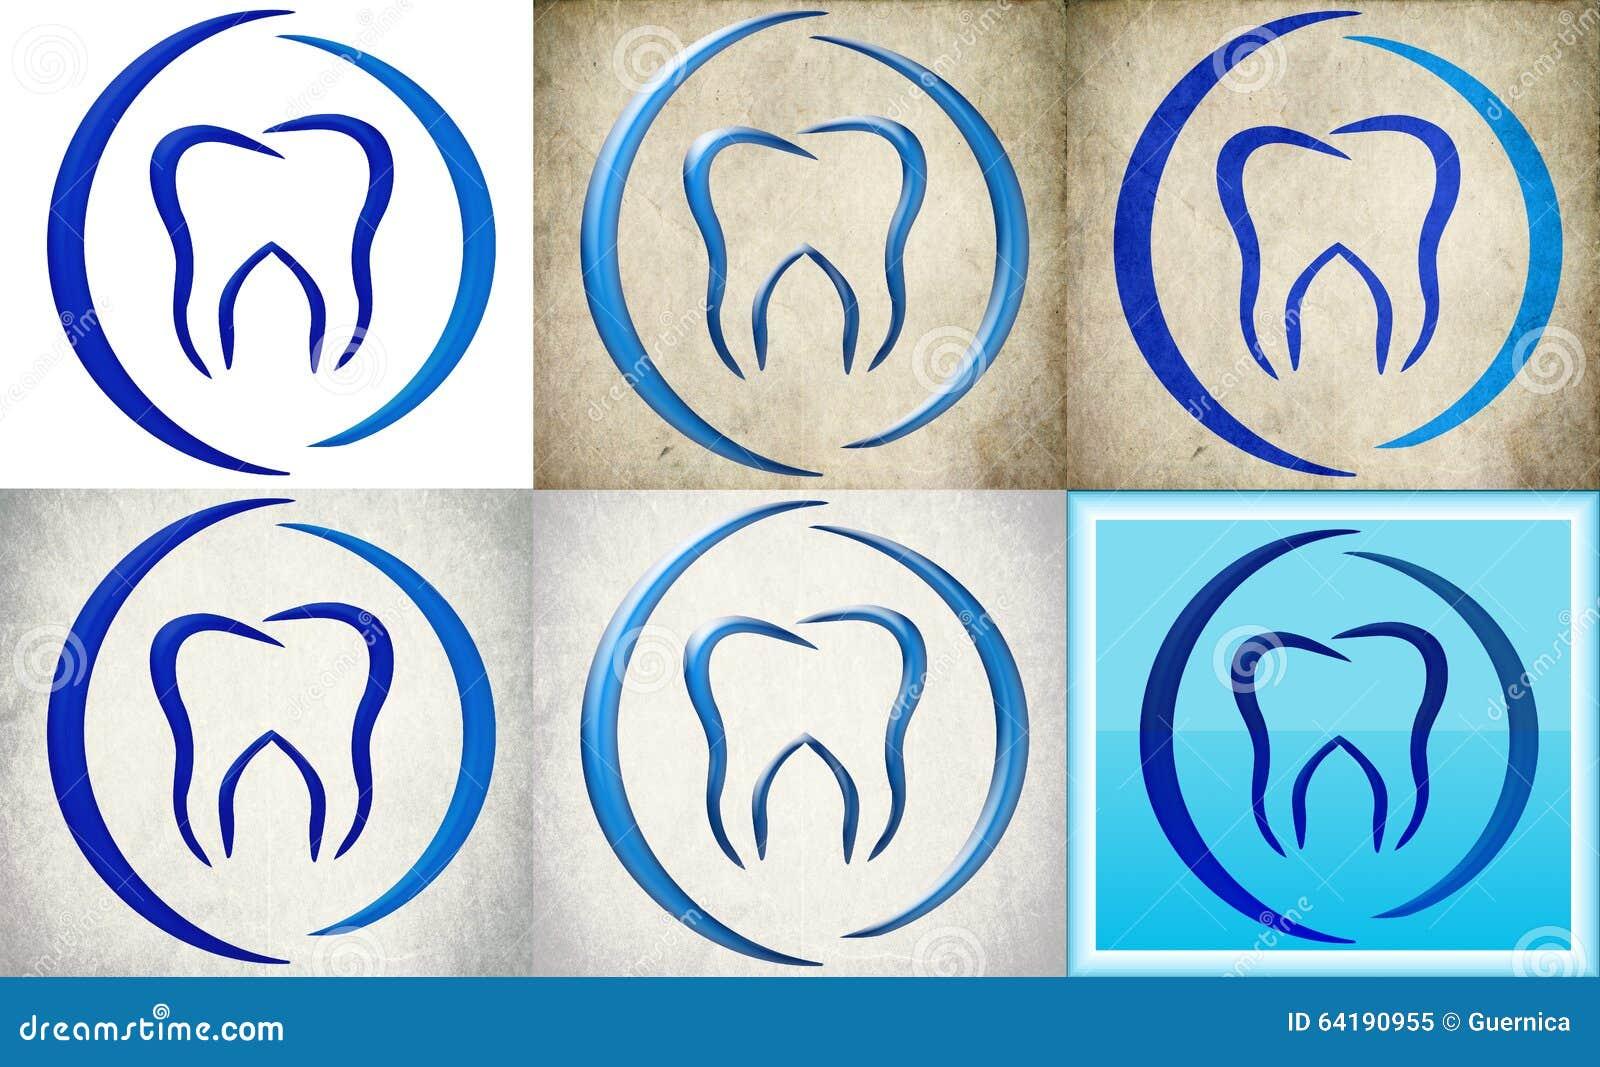 Dental Clinic Logo With Retro Background Stock Illustration ...